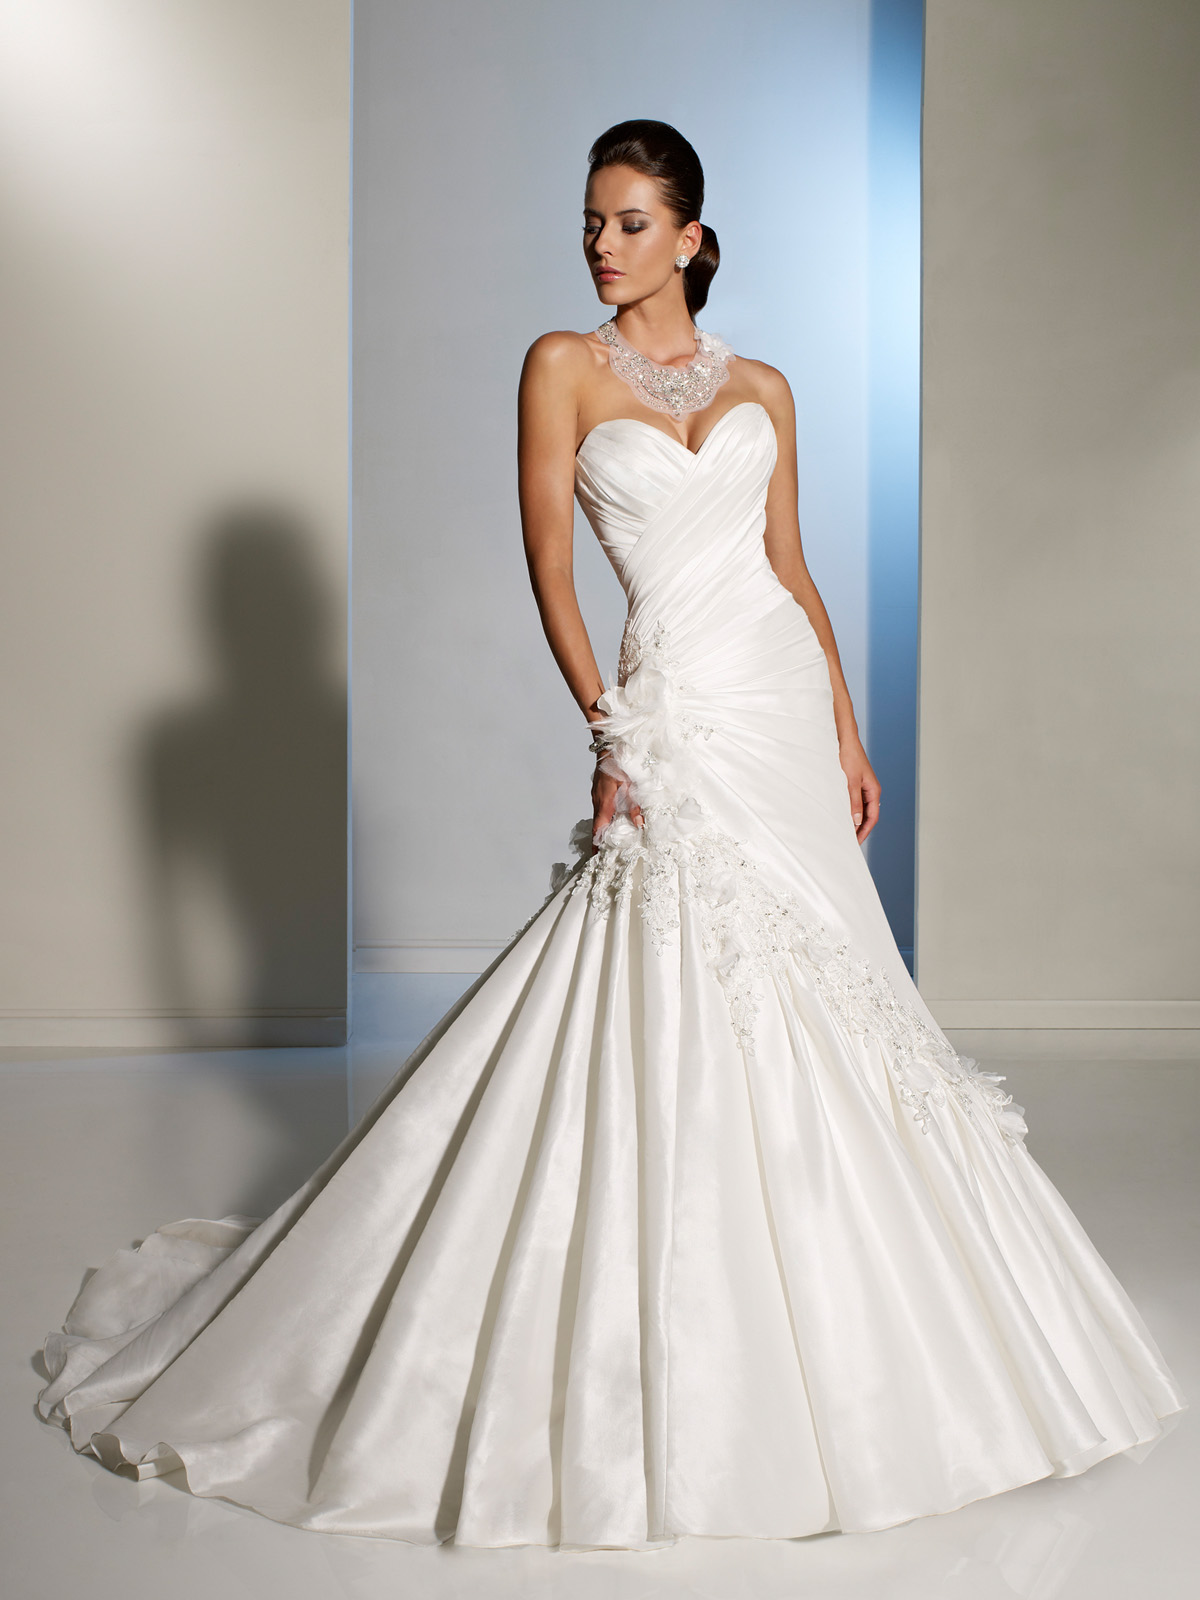 Bridal dresses uk modern twist wedding dresses by sophia tolli bridal dresses uk ombrellifo Gallery